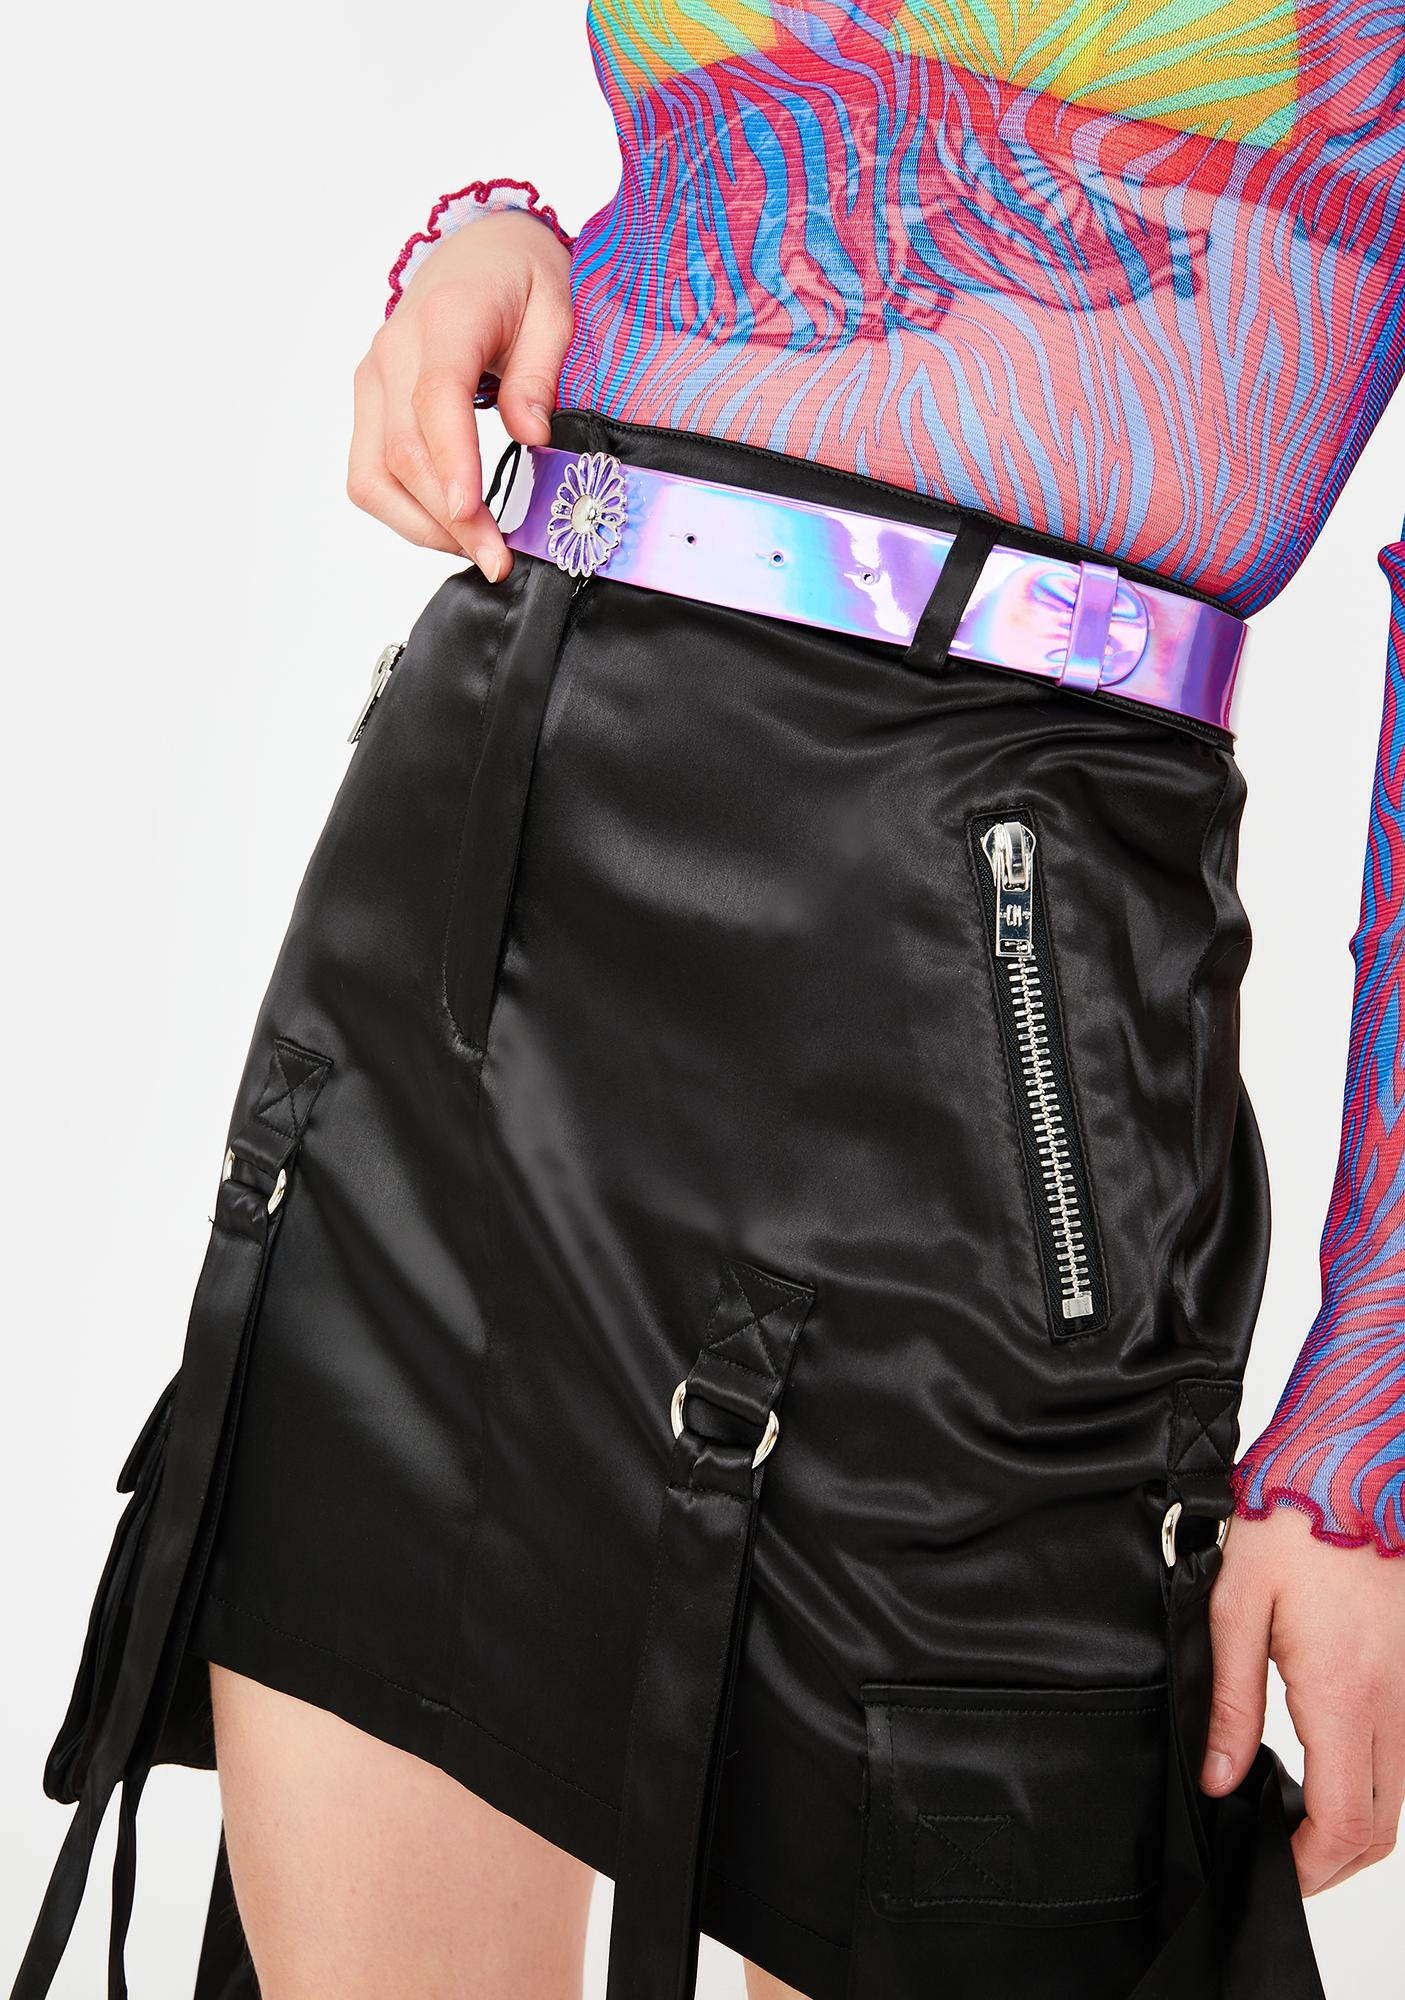 Daisy Dream Holographic Belt